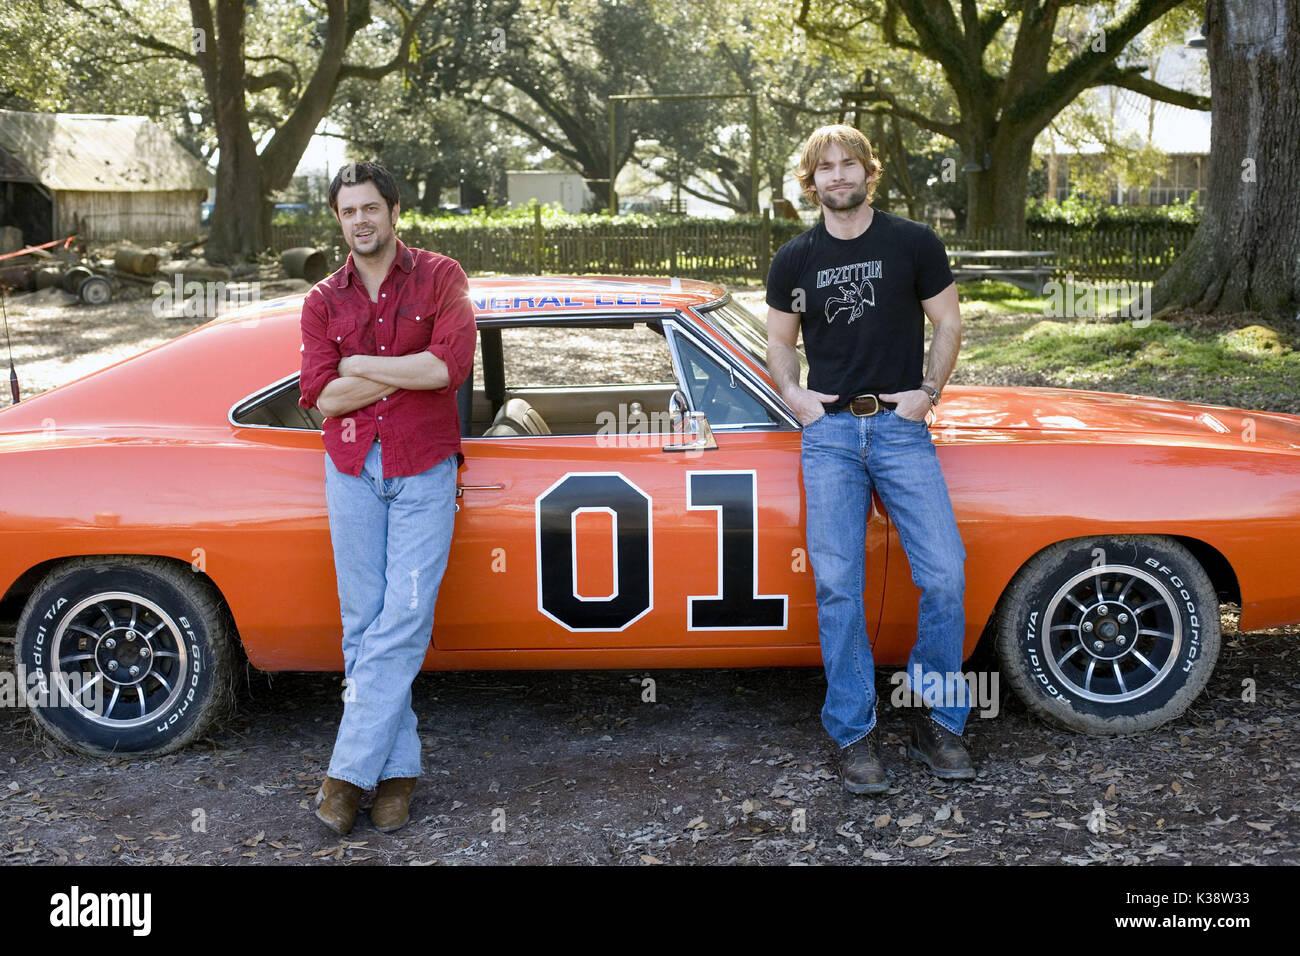 Cars For Sale Nashville Tn >> Dukes Of Hazzard Stock Photos & Dukes Of Hazzard Stock ...